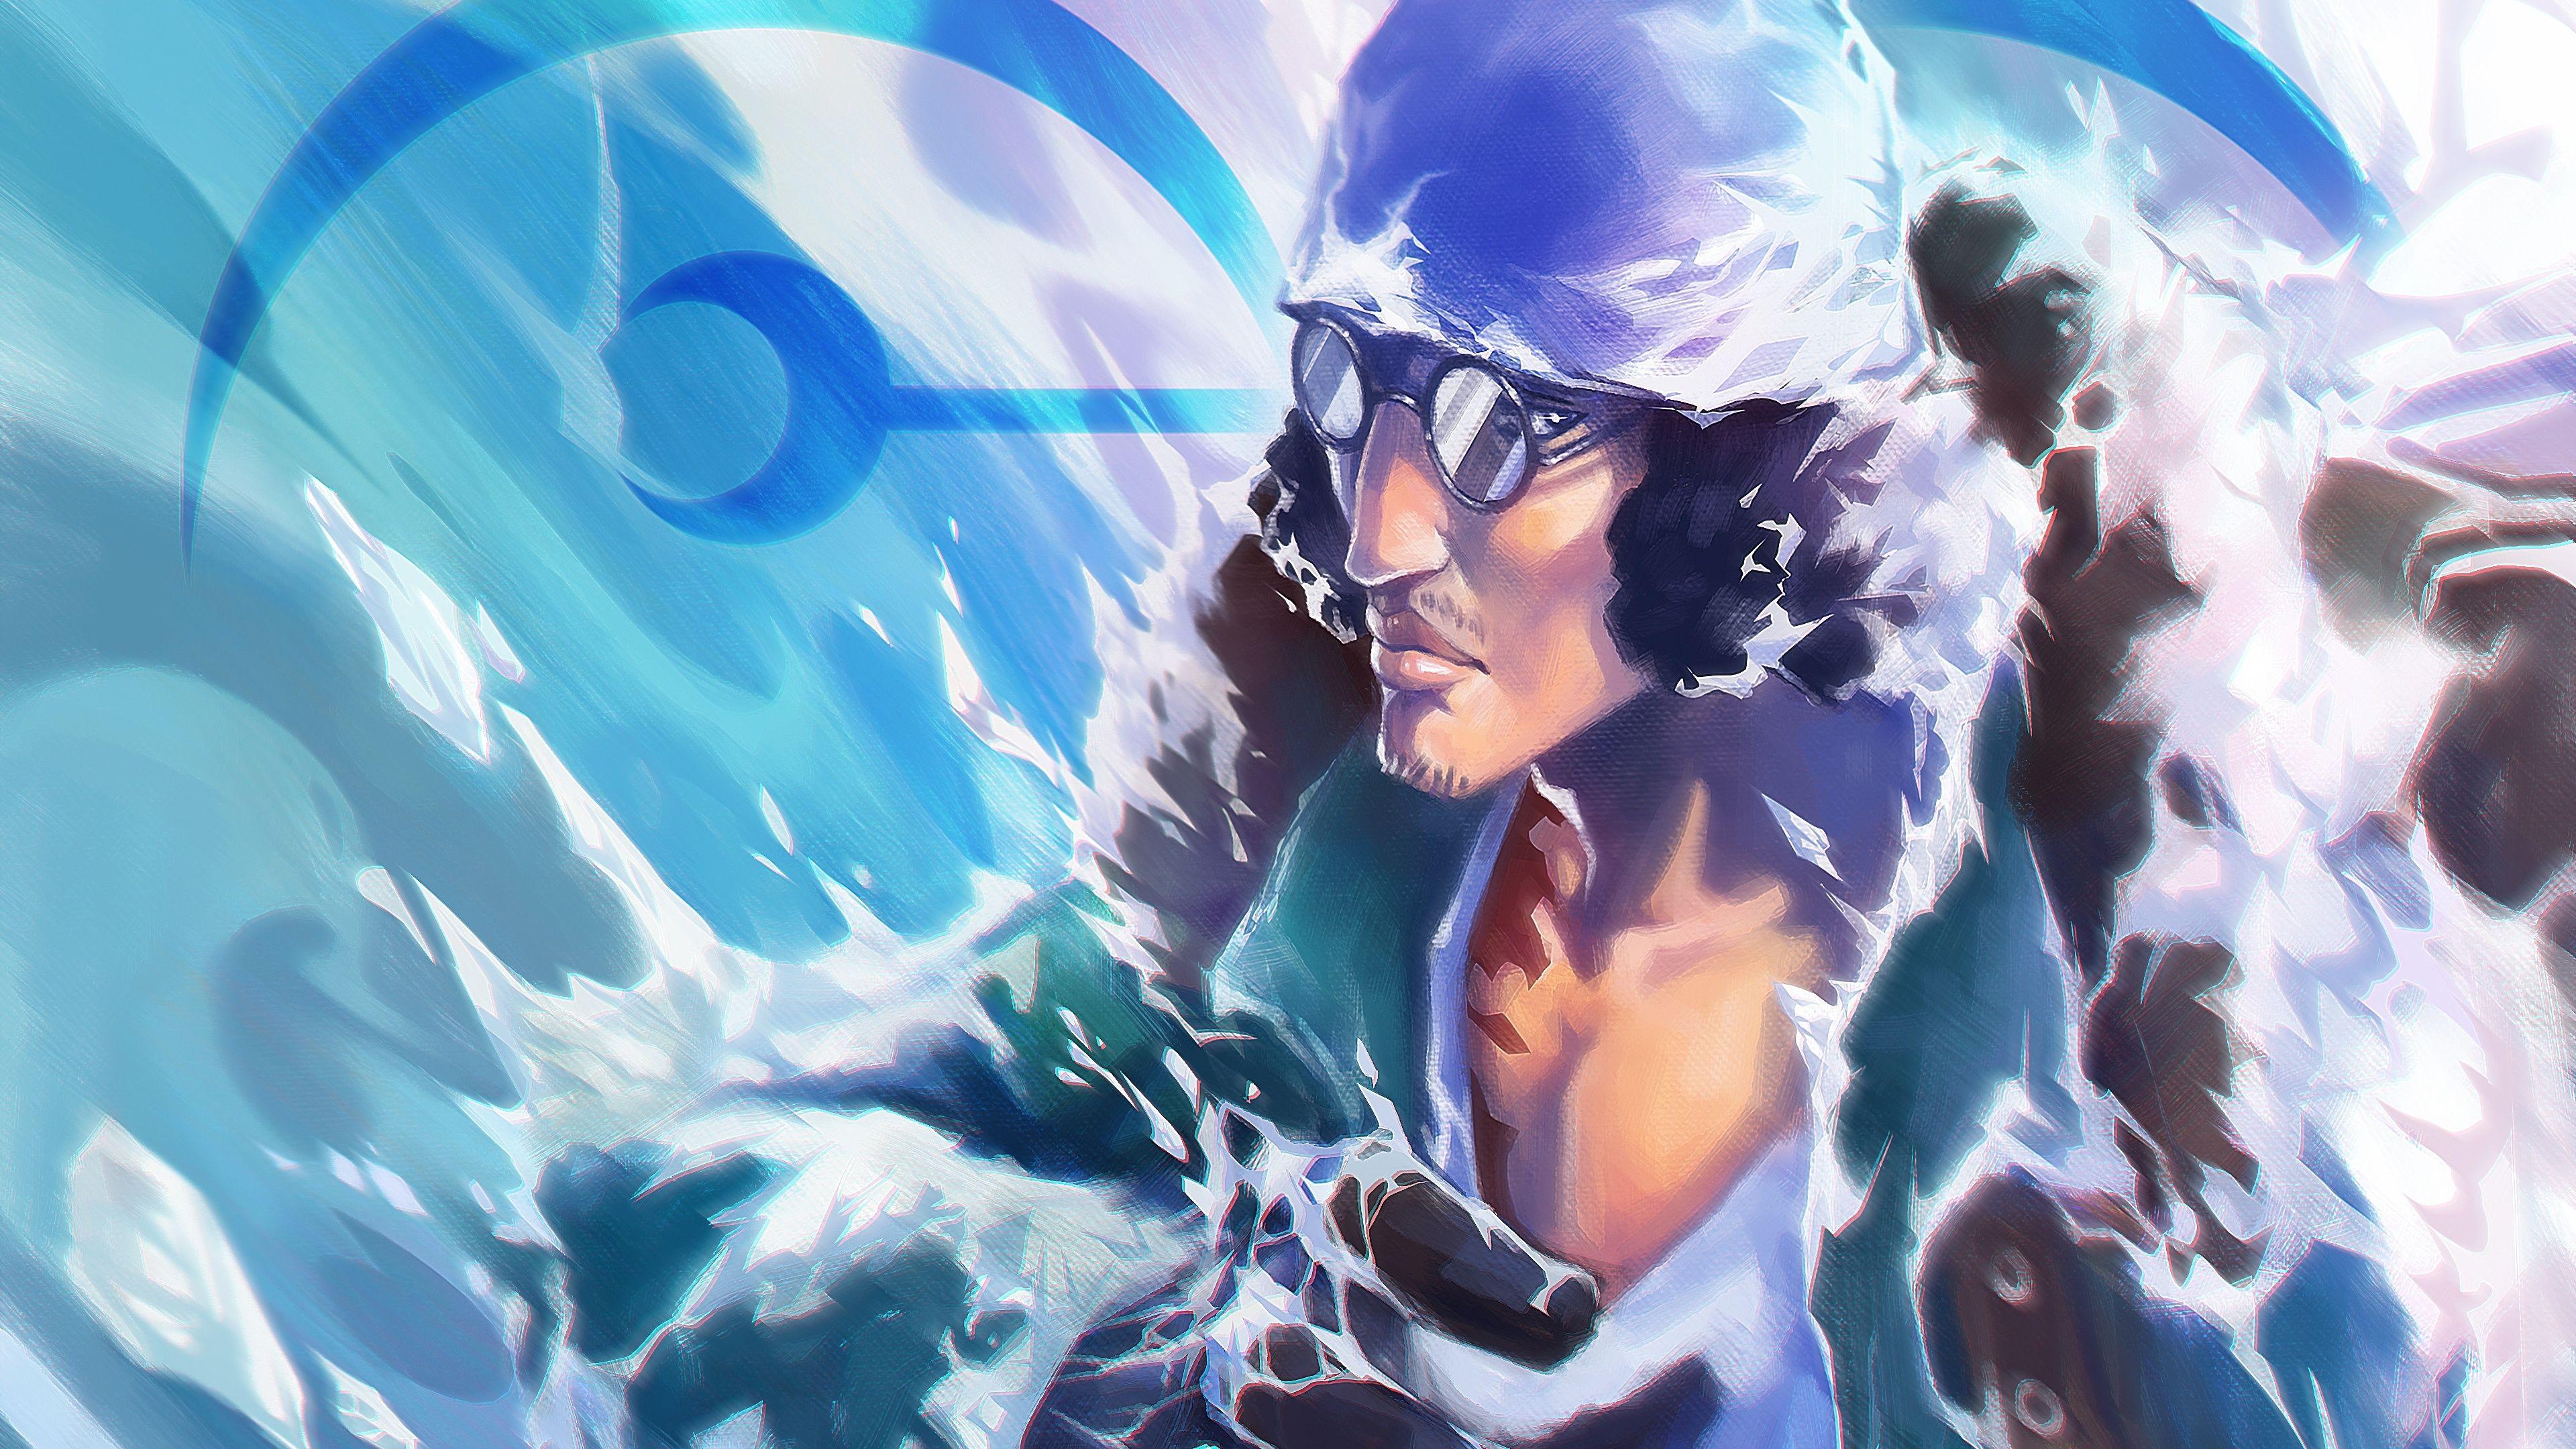 Kuzan One Piece Anime 4k One Piece Wallpapers Hd Wallpapers Anime Wallpapers 4k Wallpapers Wallpaper Anime Wolf Art